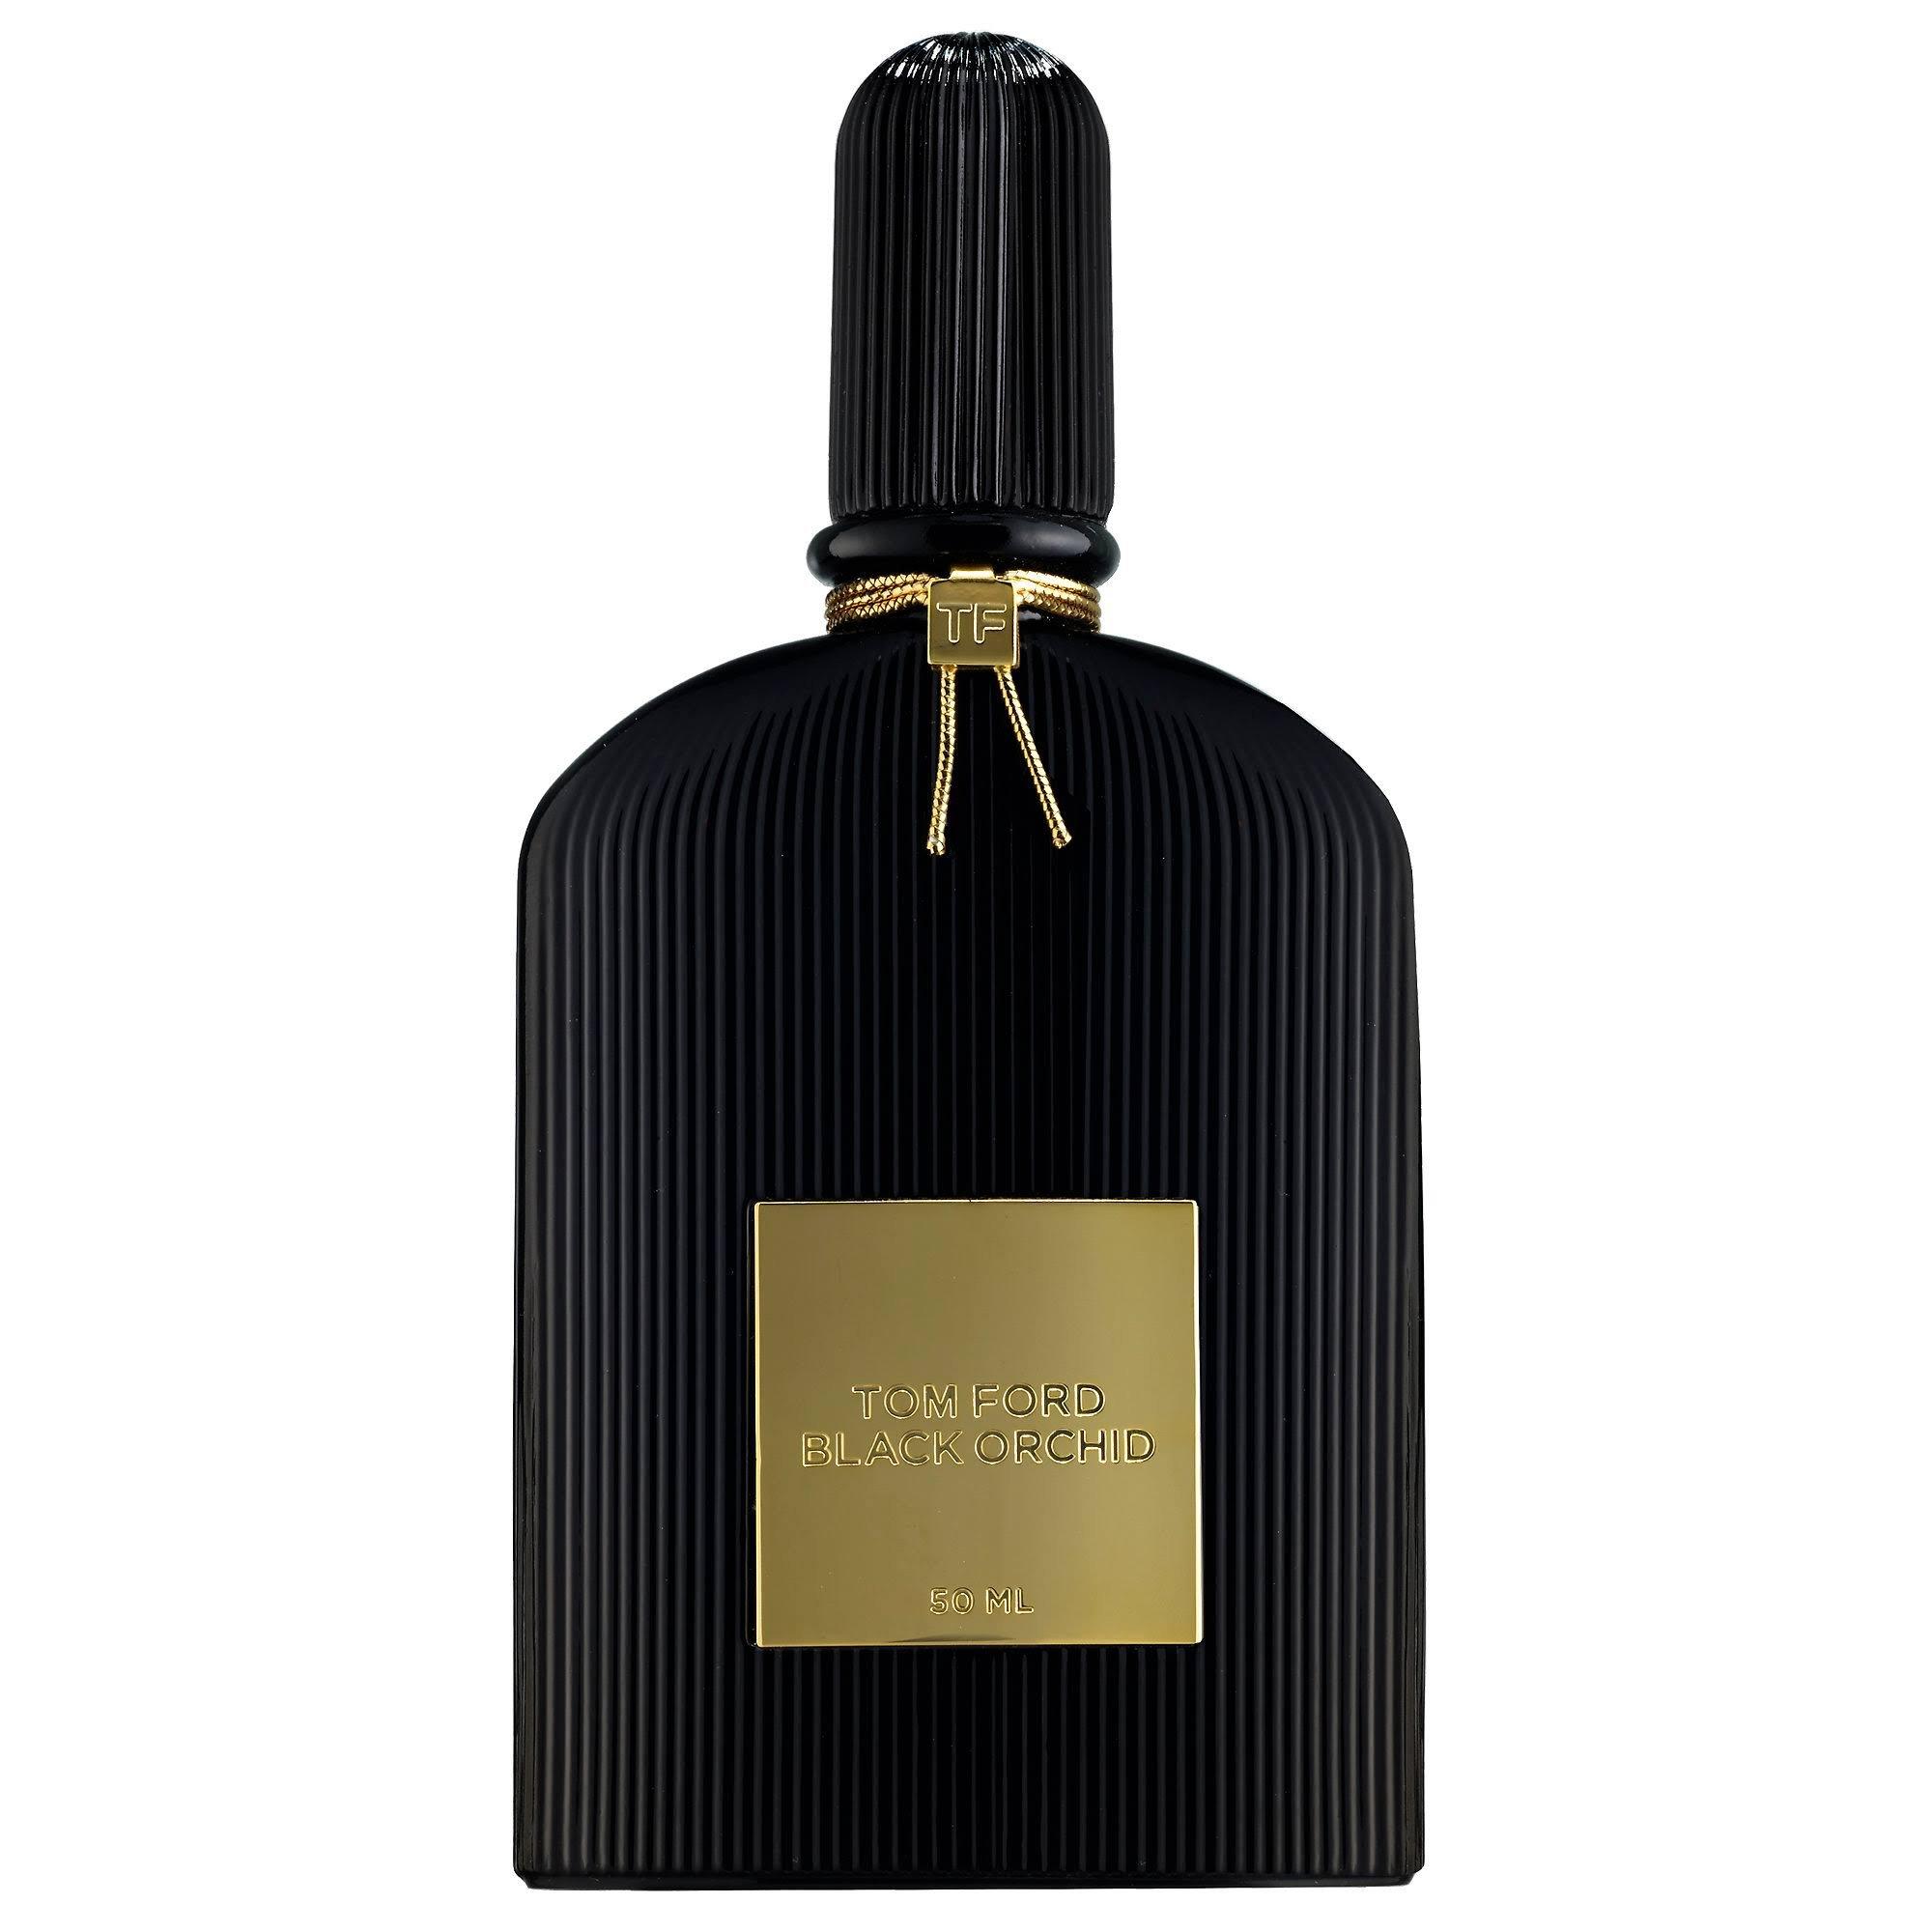 Amazoncom Black Orchid By Tom Ford For Women Eau De Parfum Spray